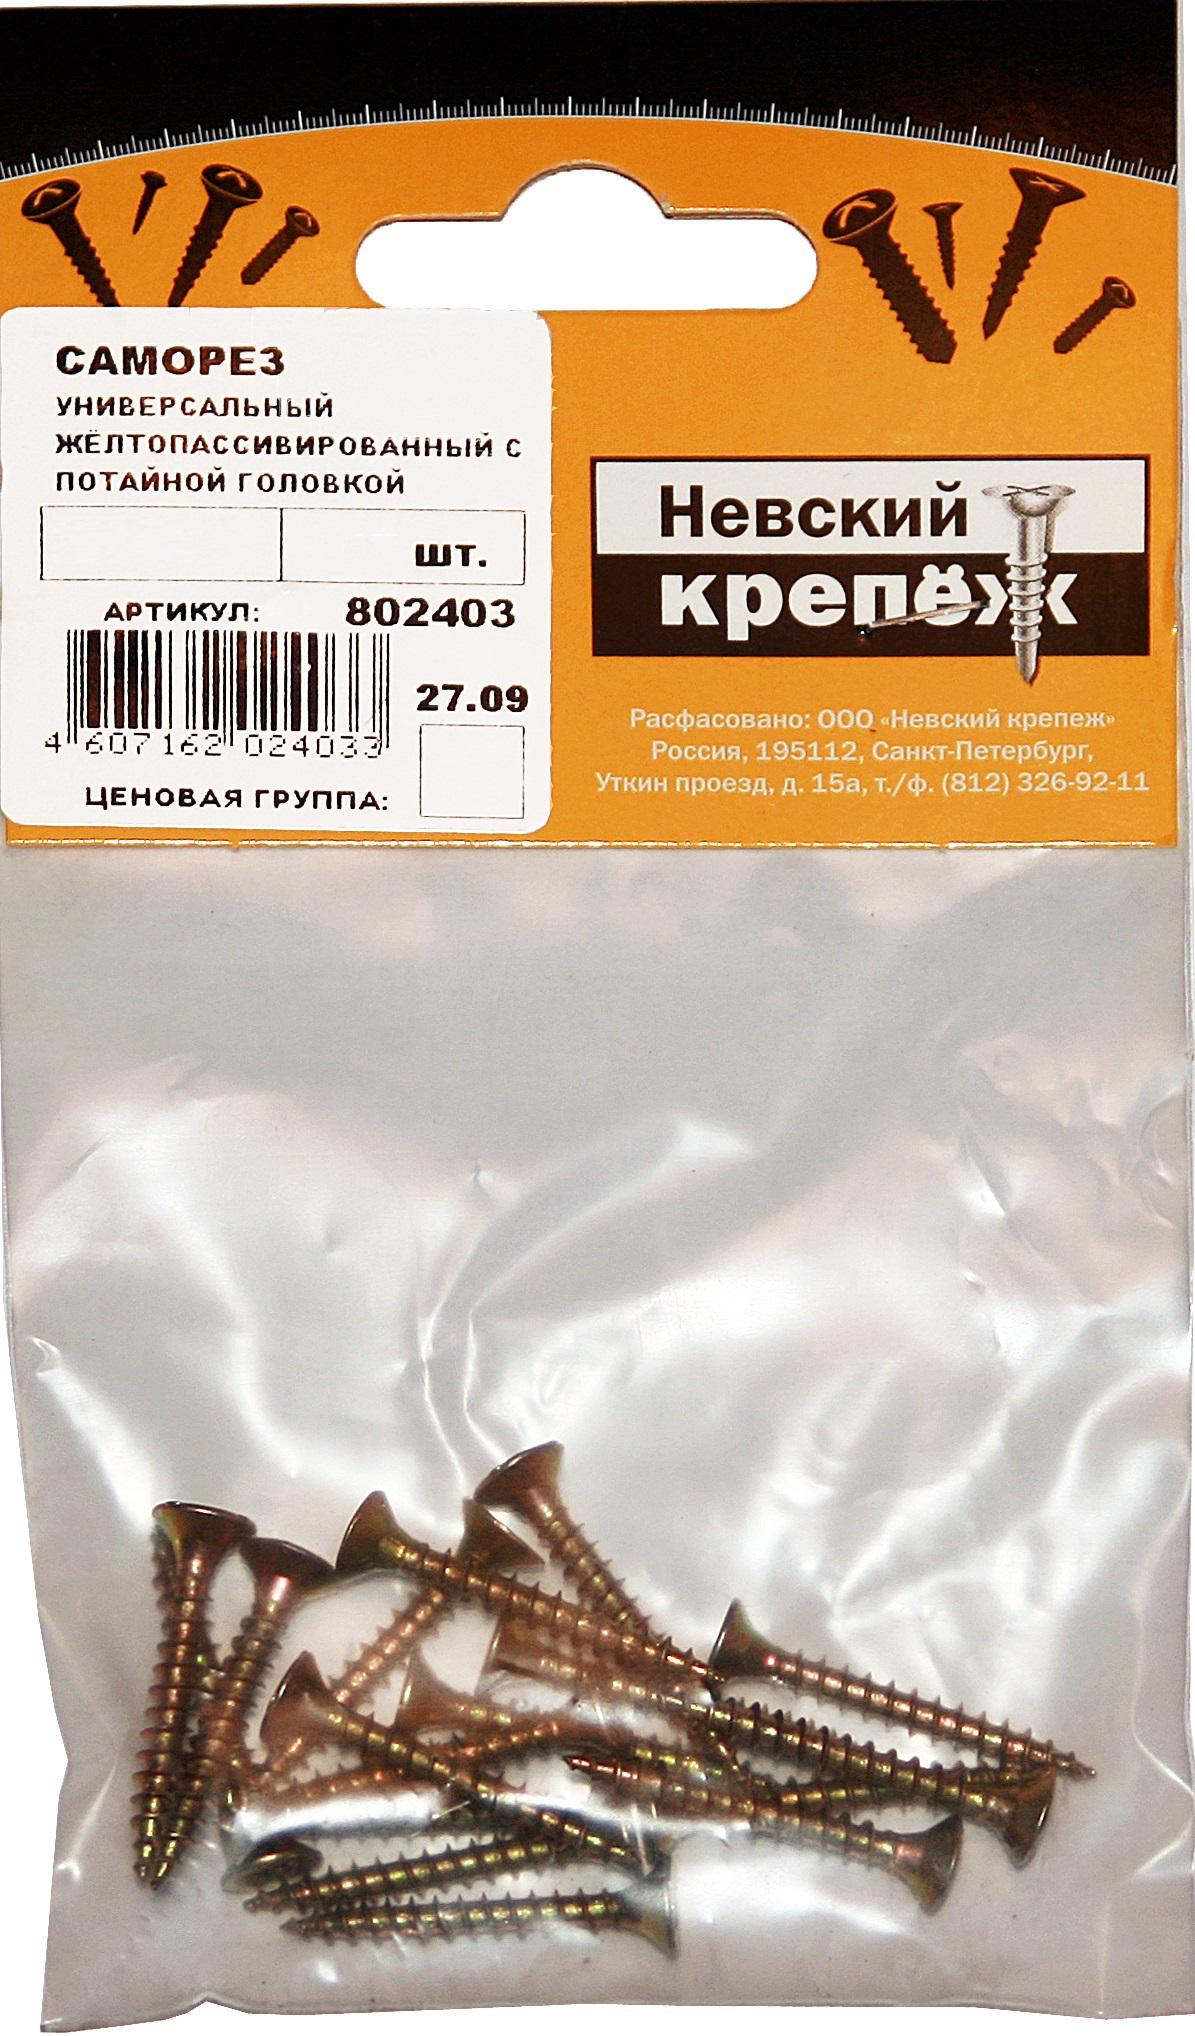 Саморез НЕВСКИЙ КРЕПЕЖ 802422